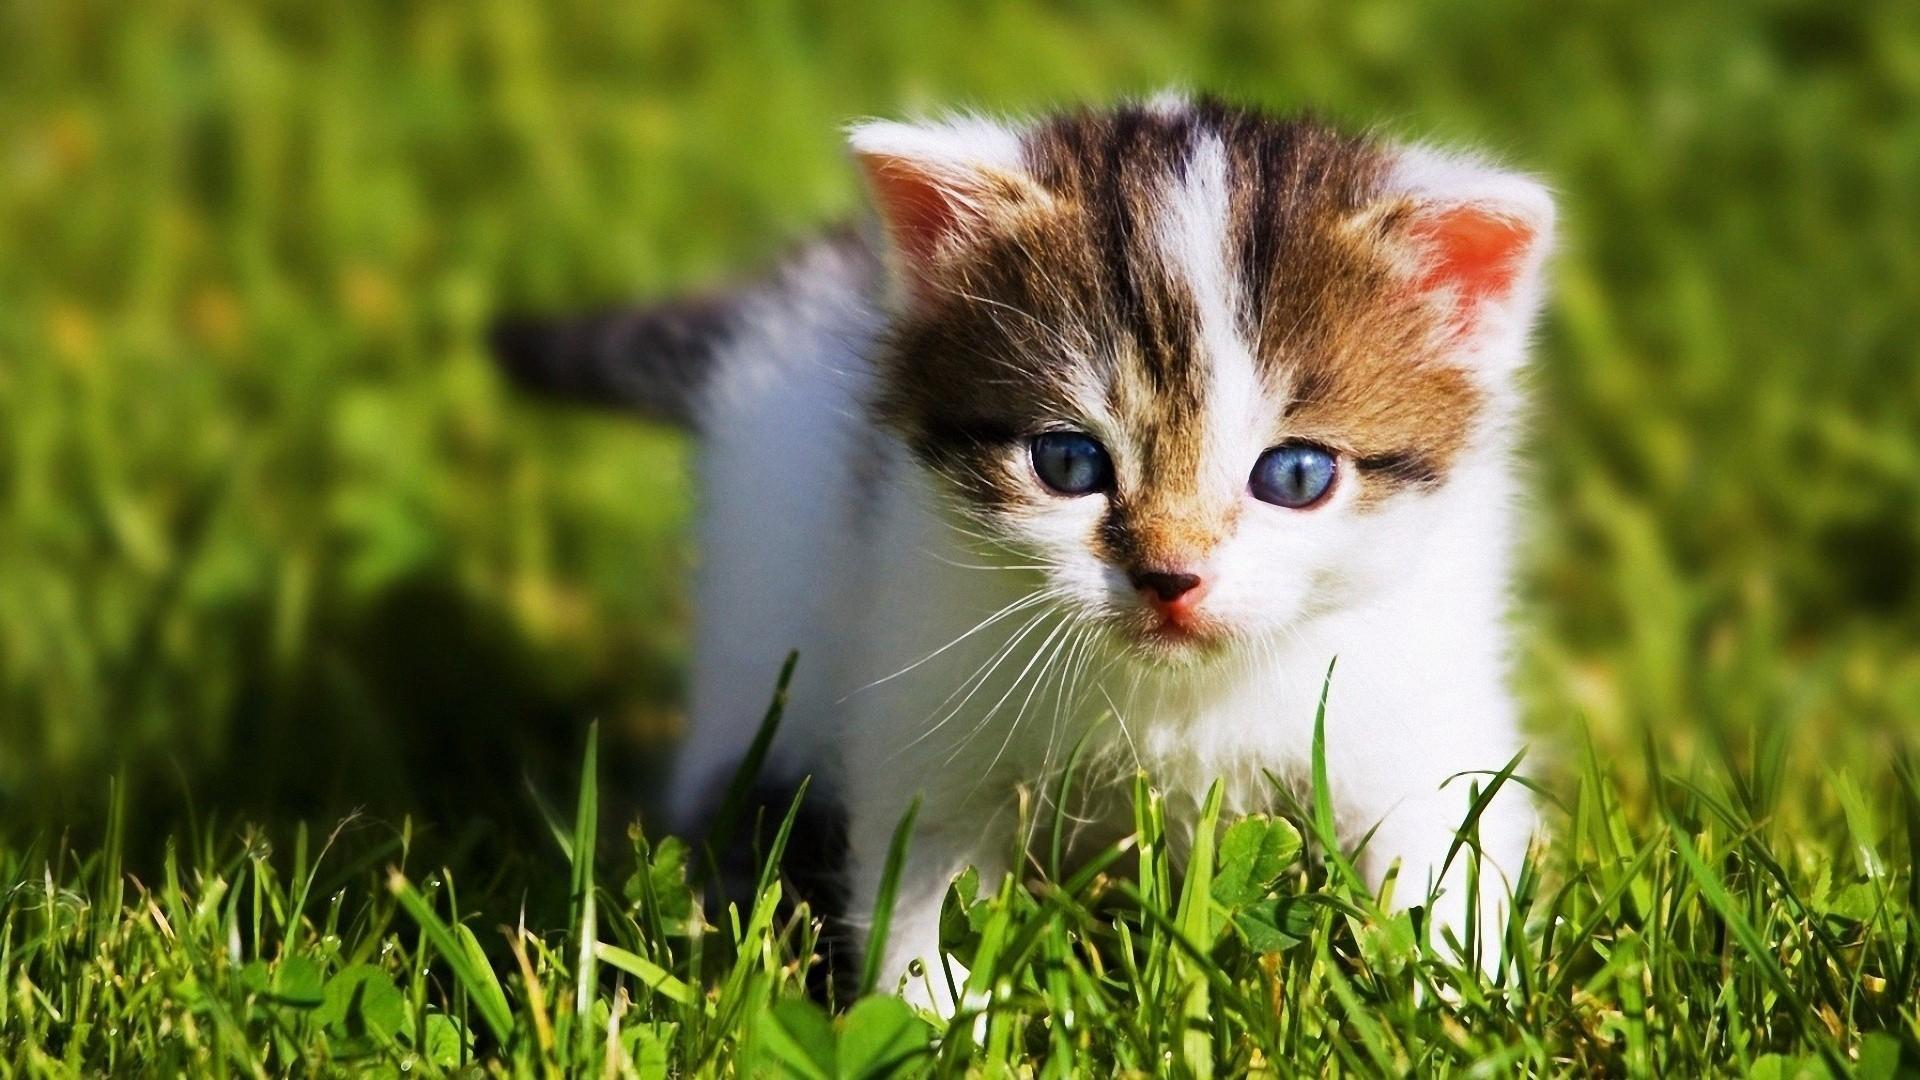 Baby Animal Wallpaper for Desktop (57+ images)